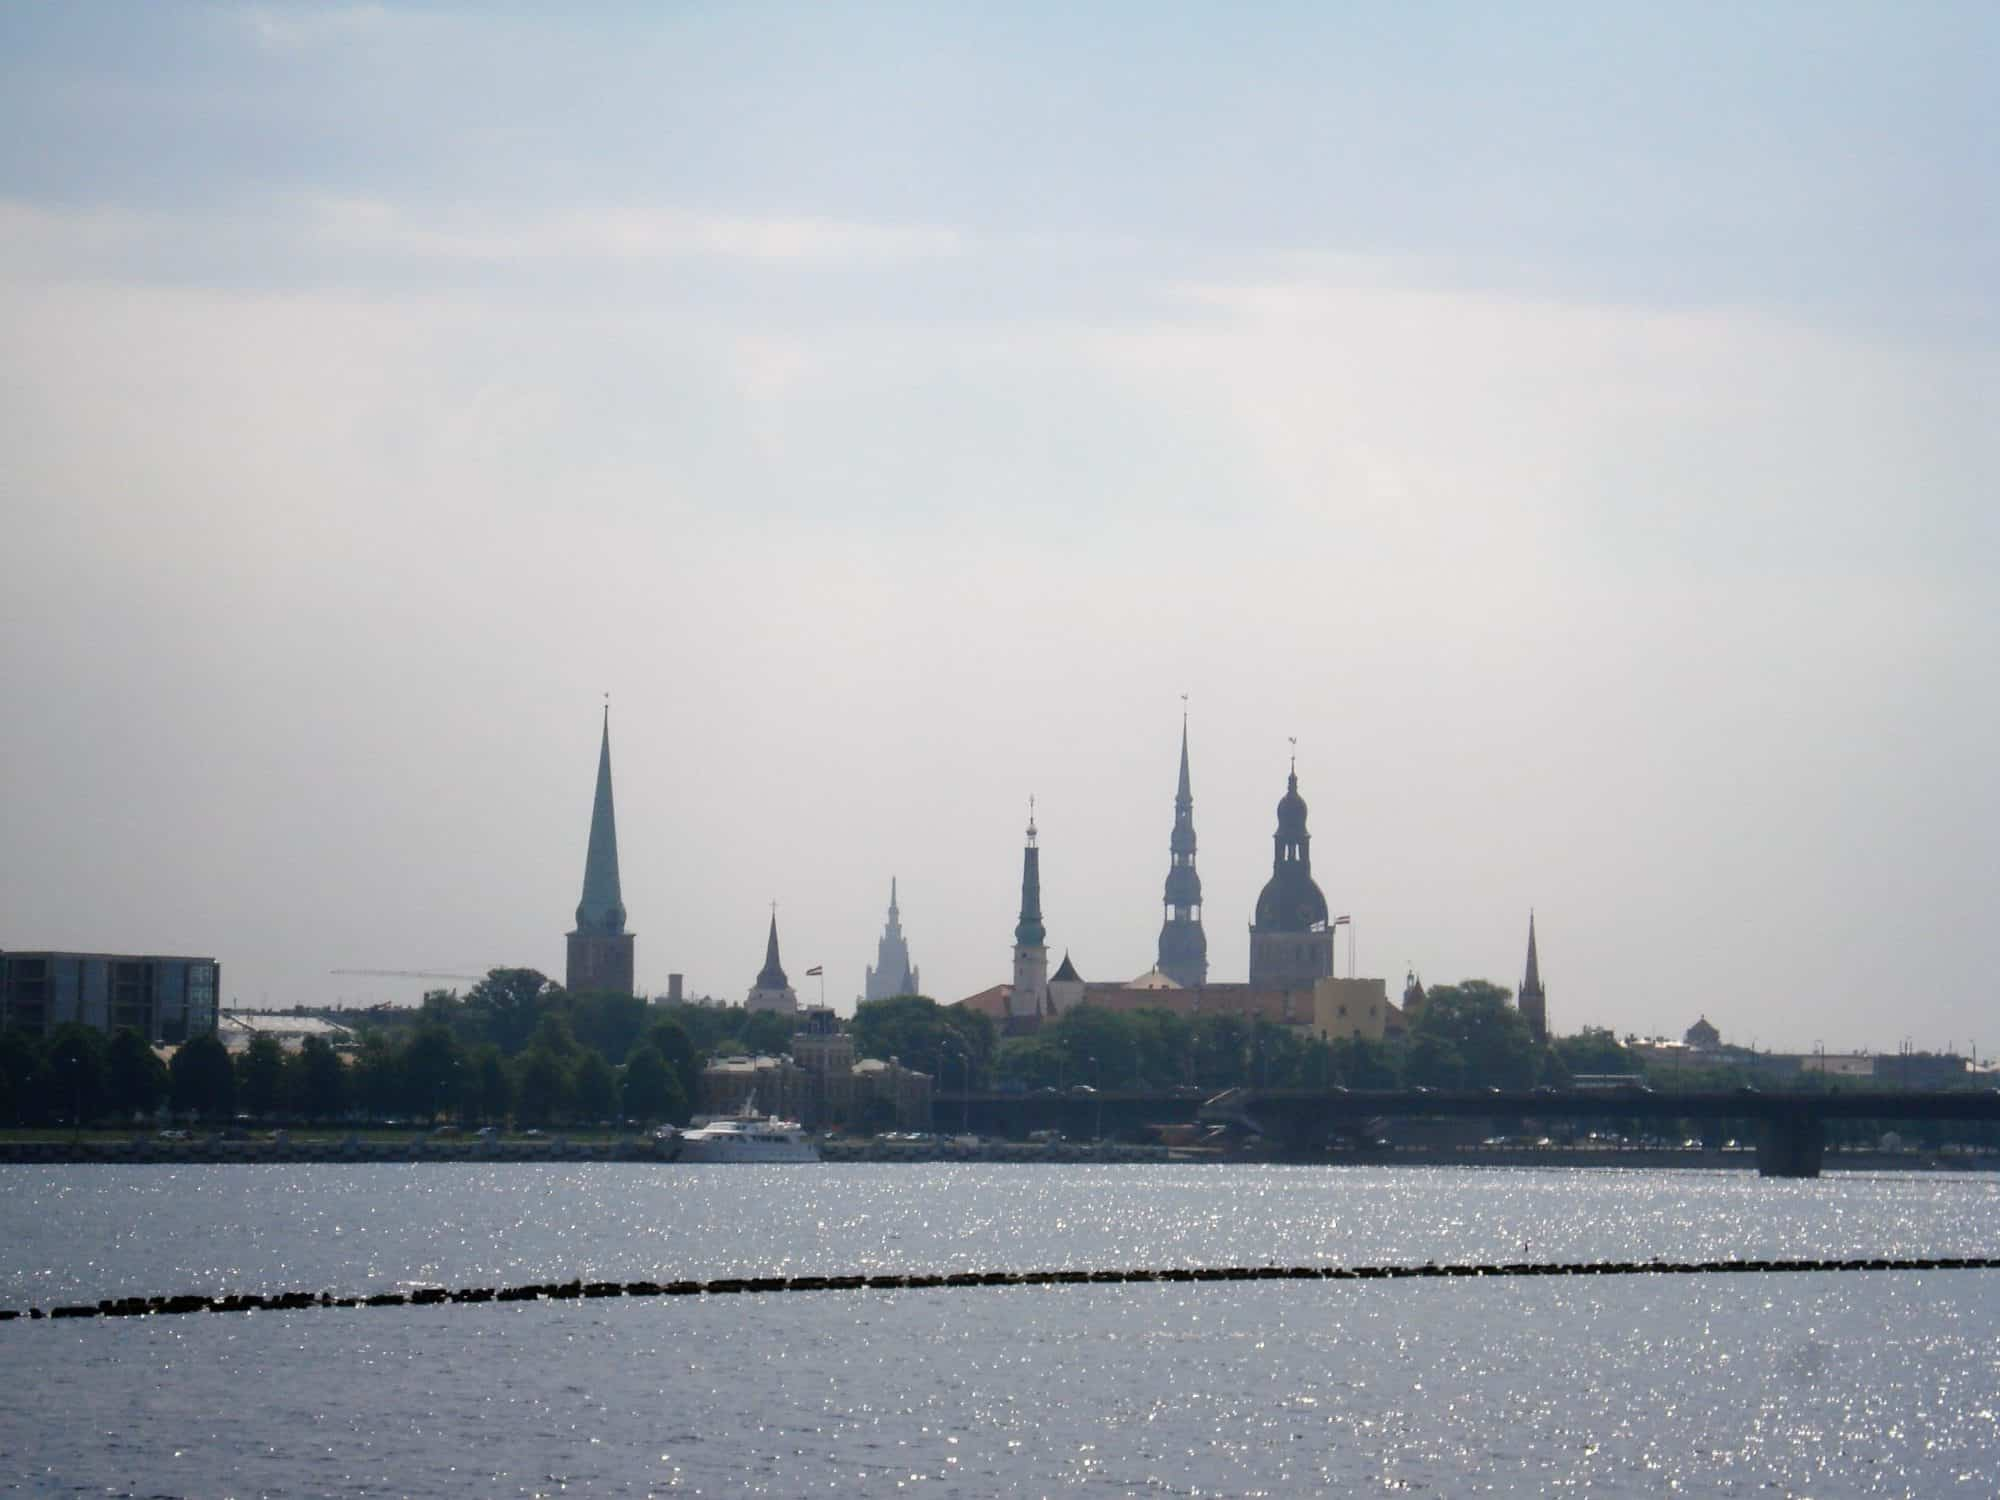 Letland_Riga view Dvina rivier